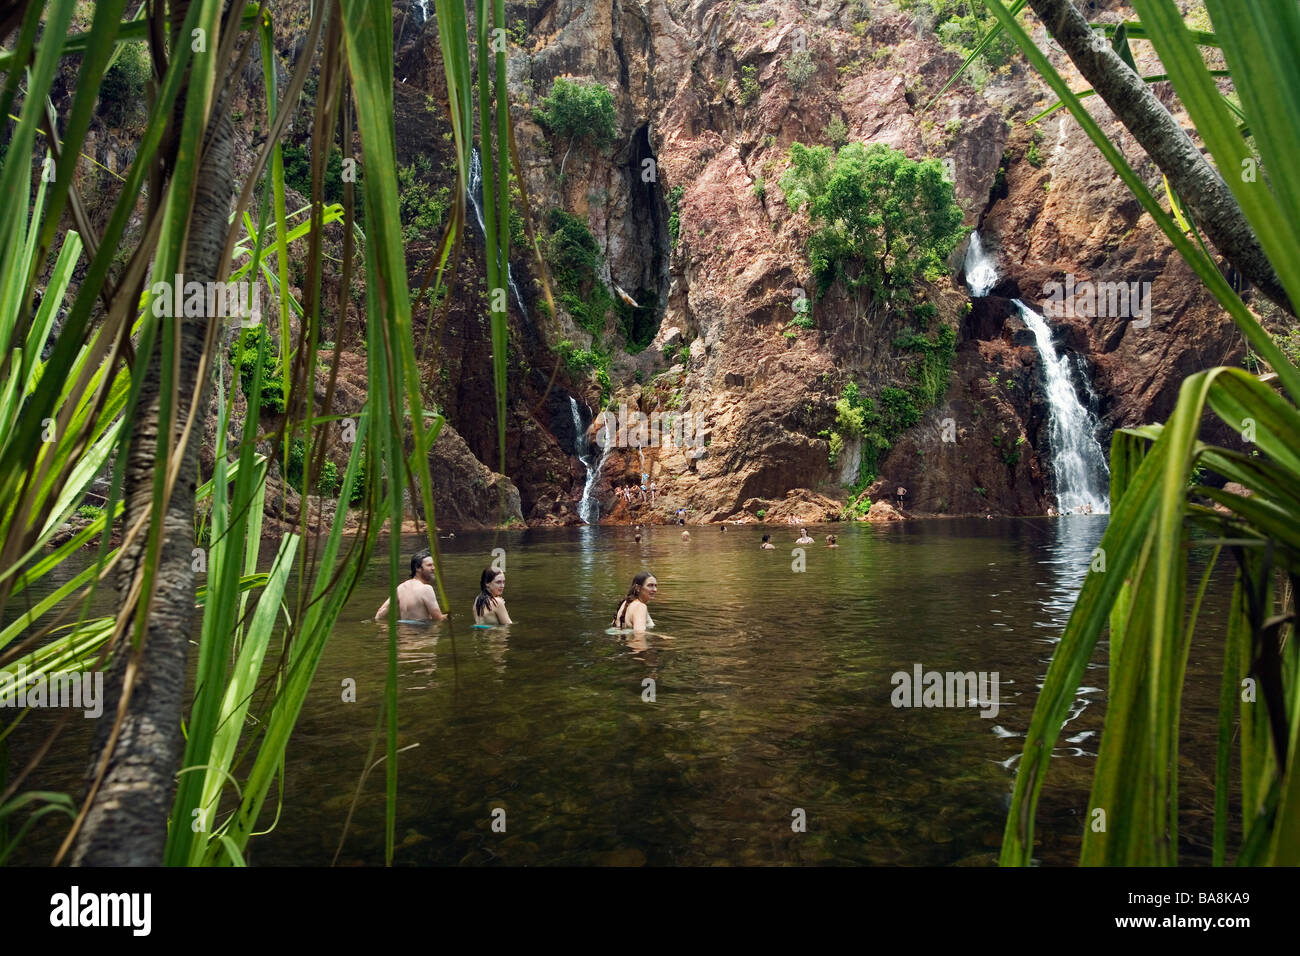 Wangi Falls. Litchfield National Park, Northern Territory, AUSTRALIA. - Stock Image